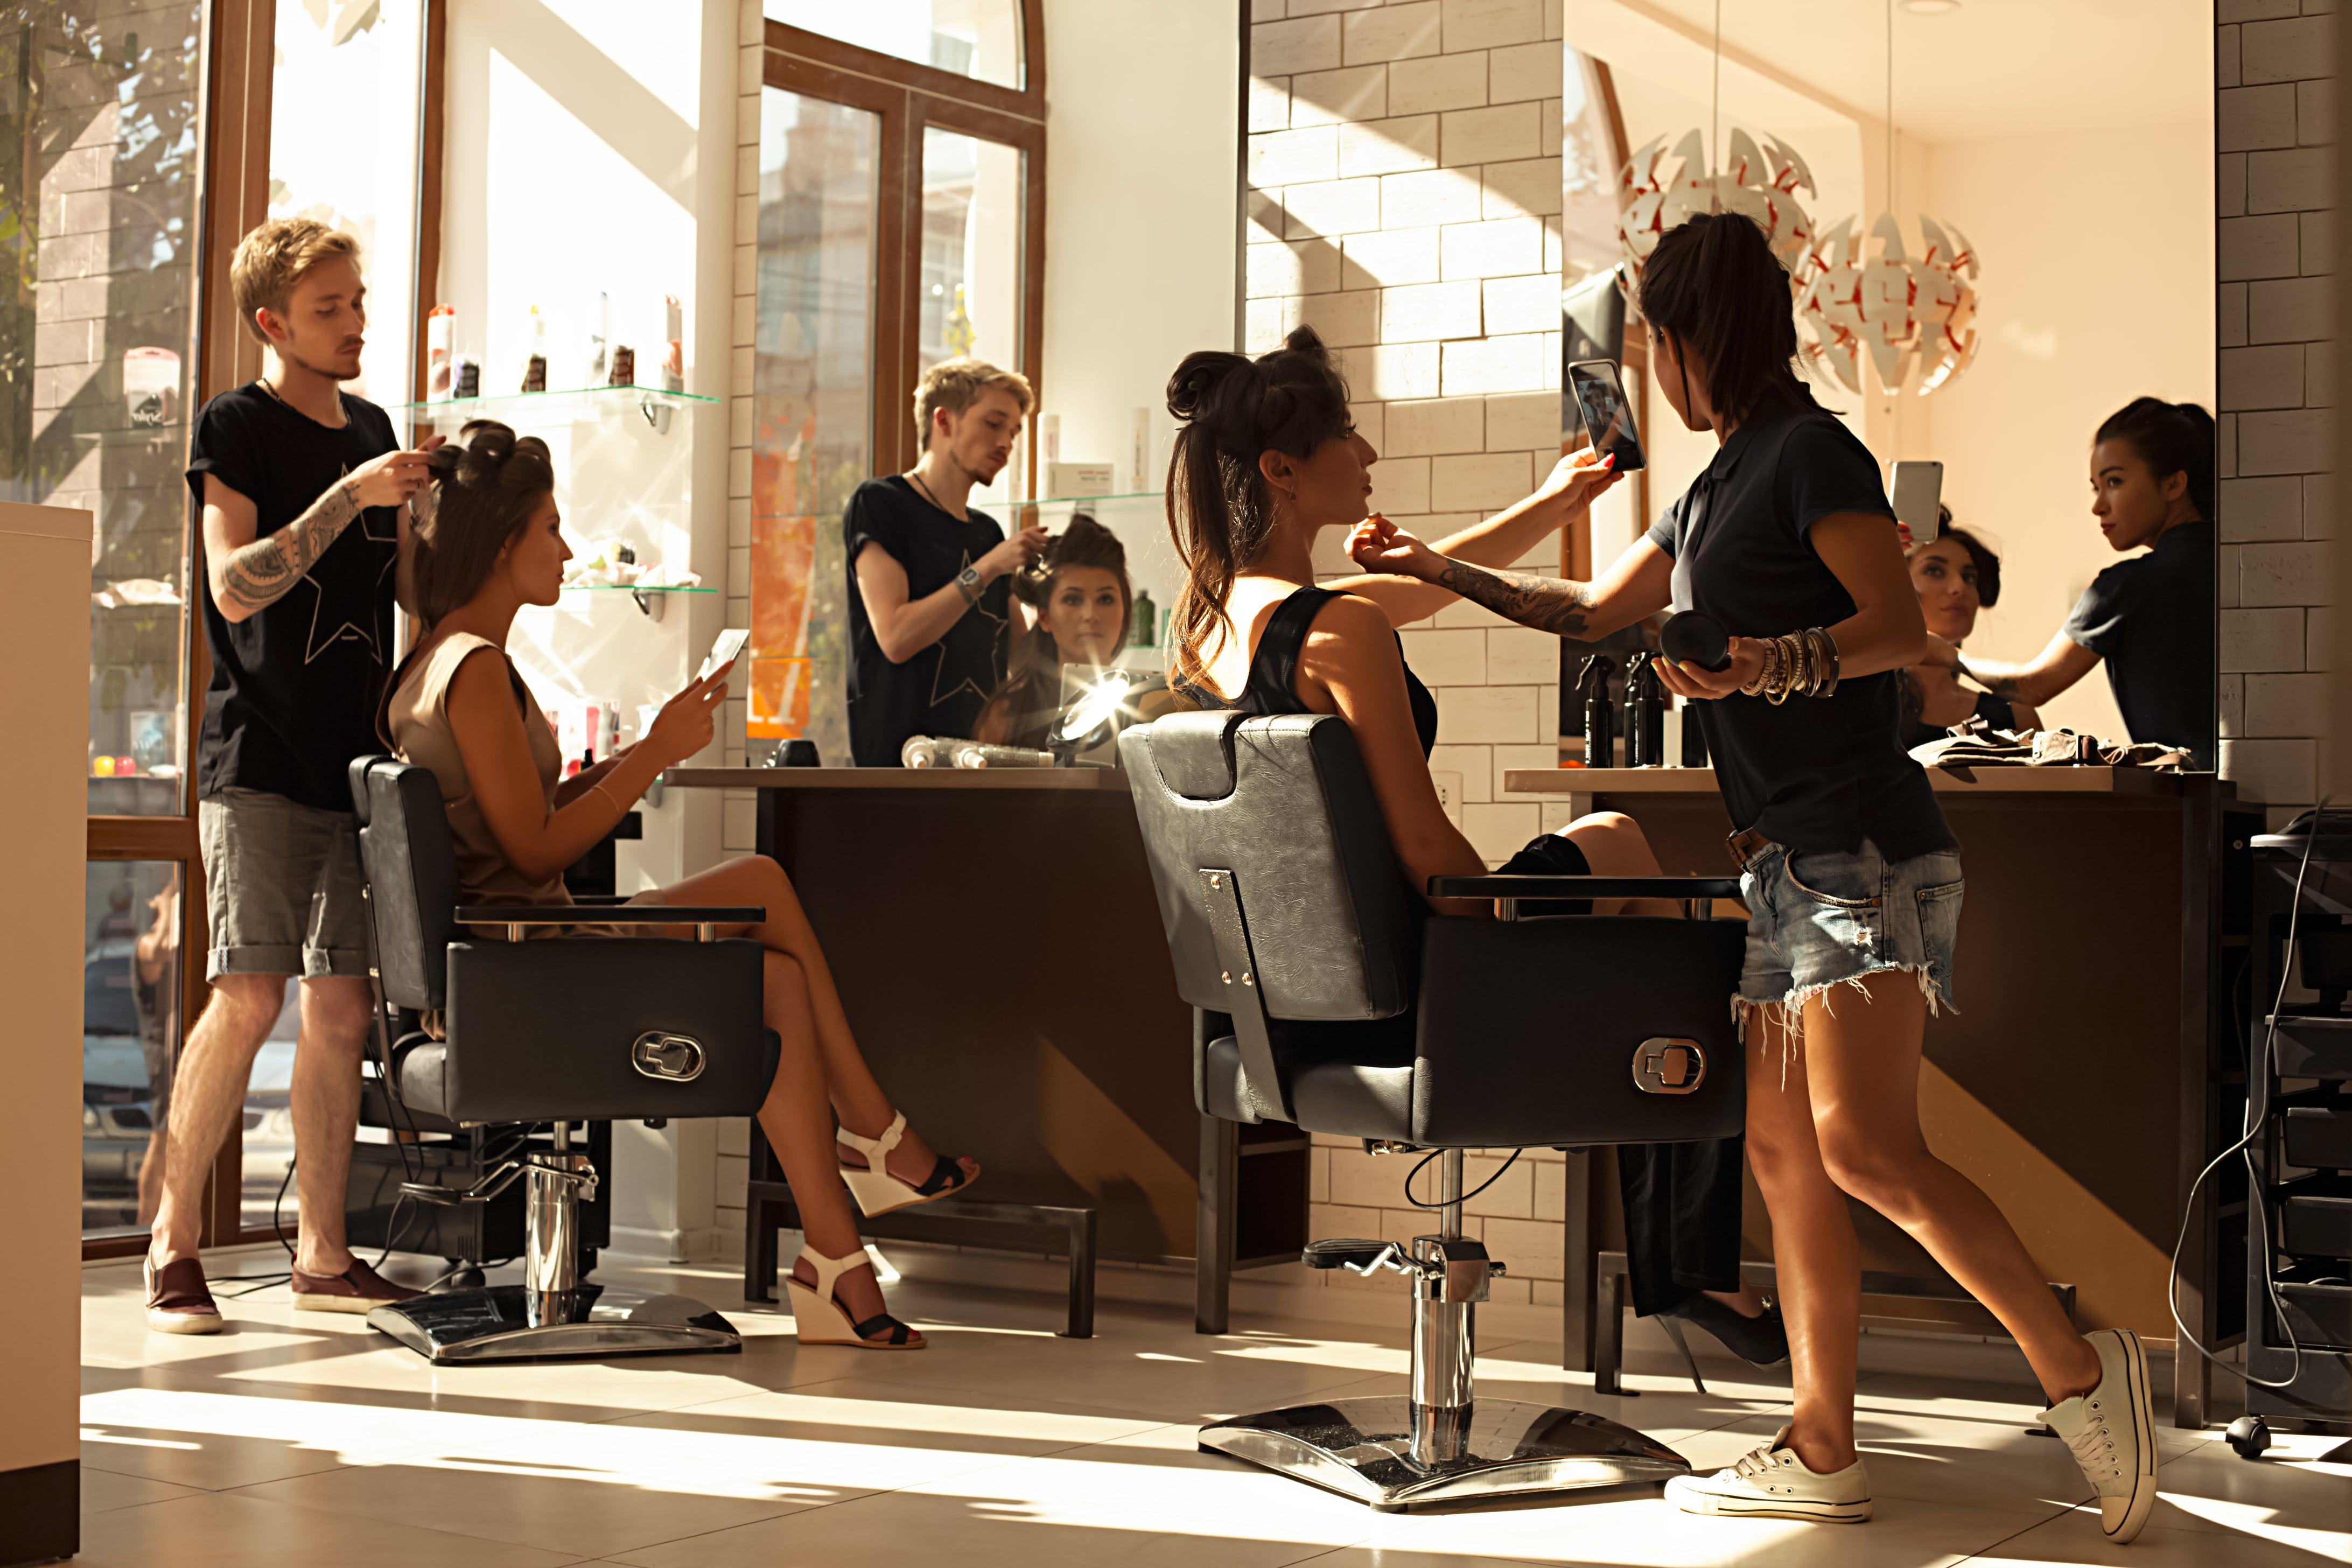 Hair Salon Staff Rostering 2